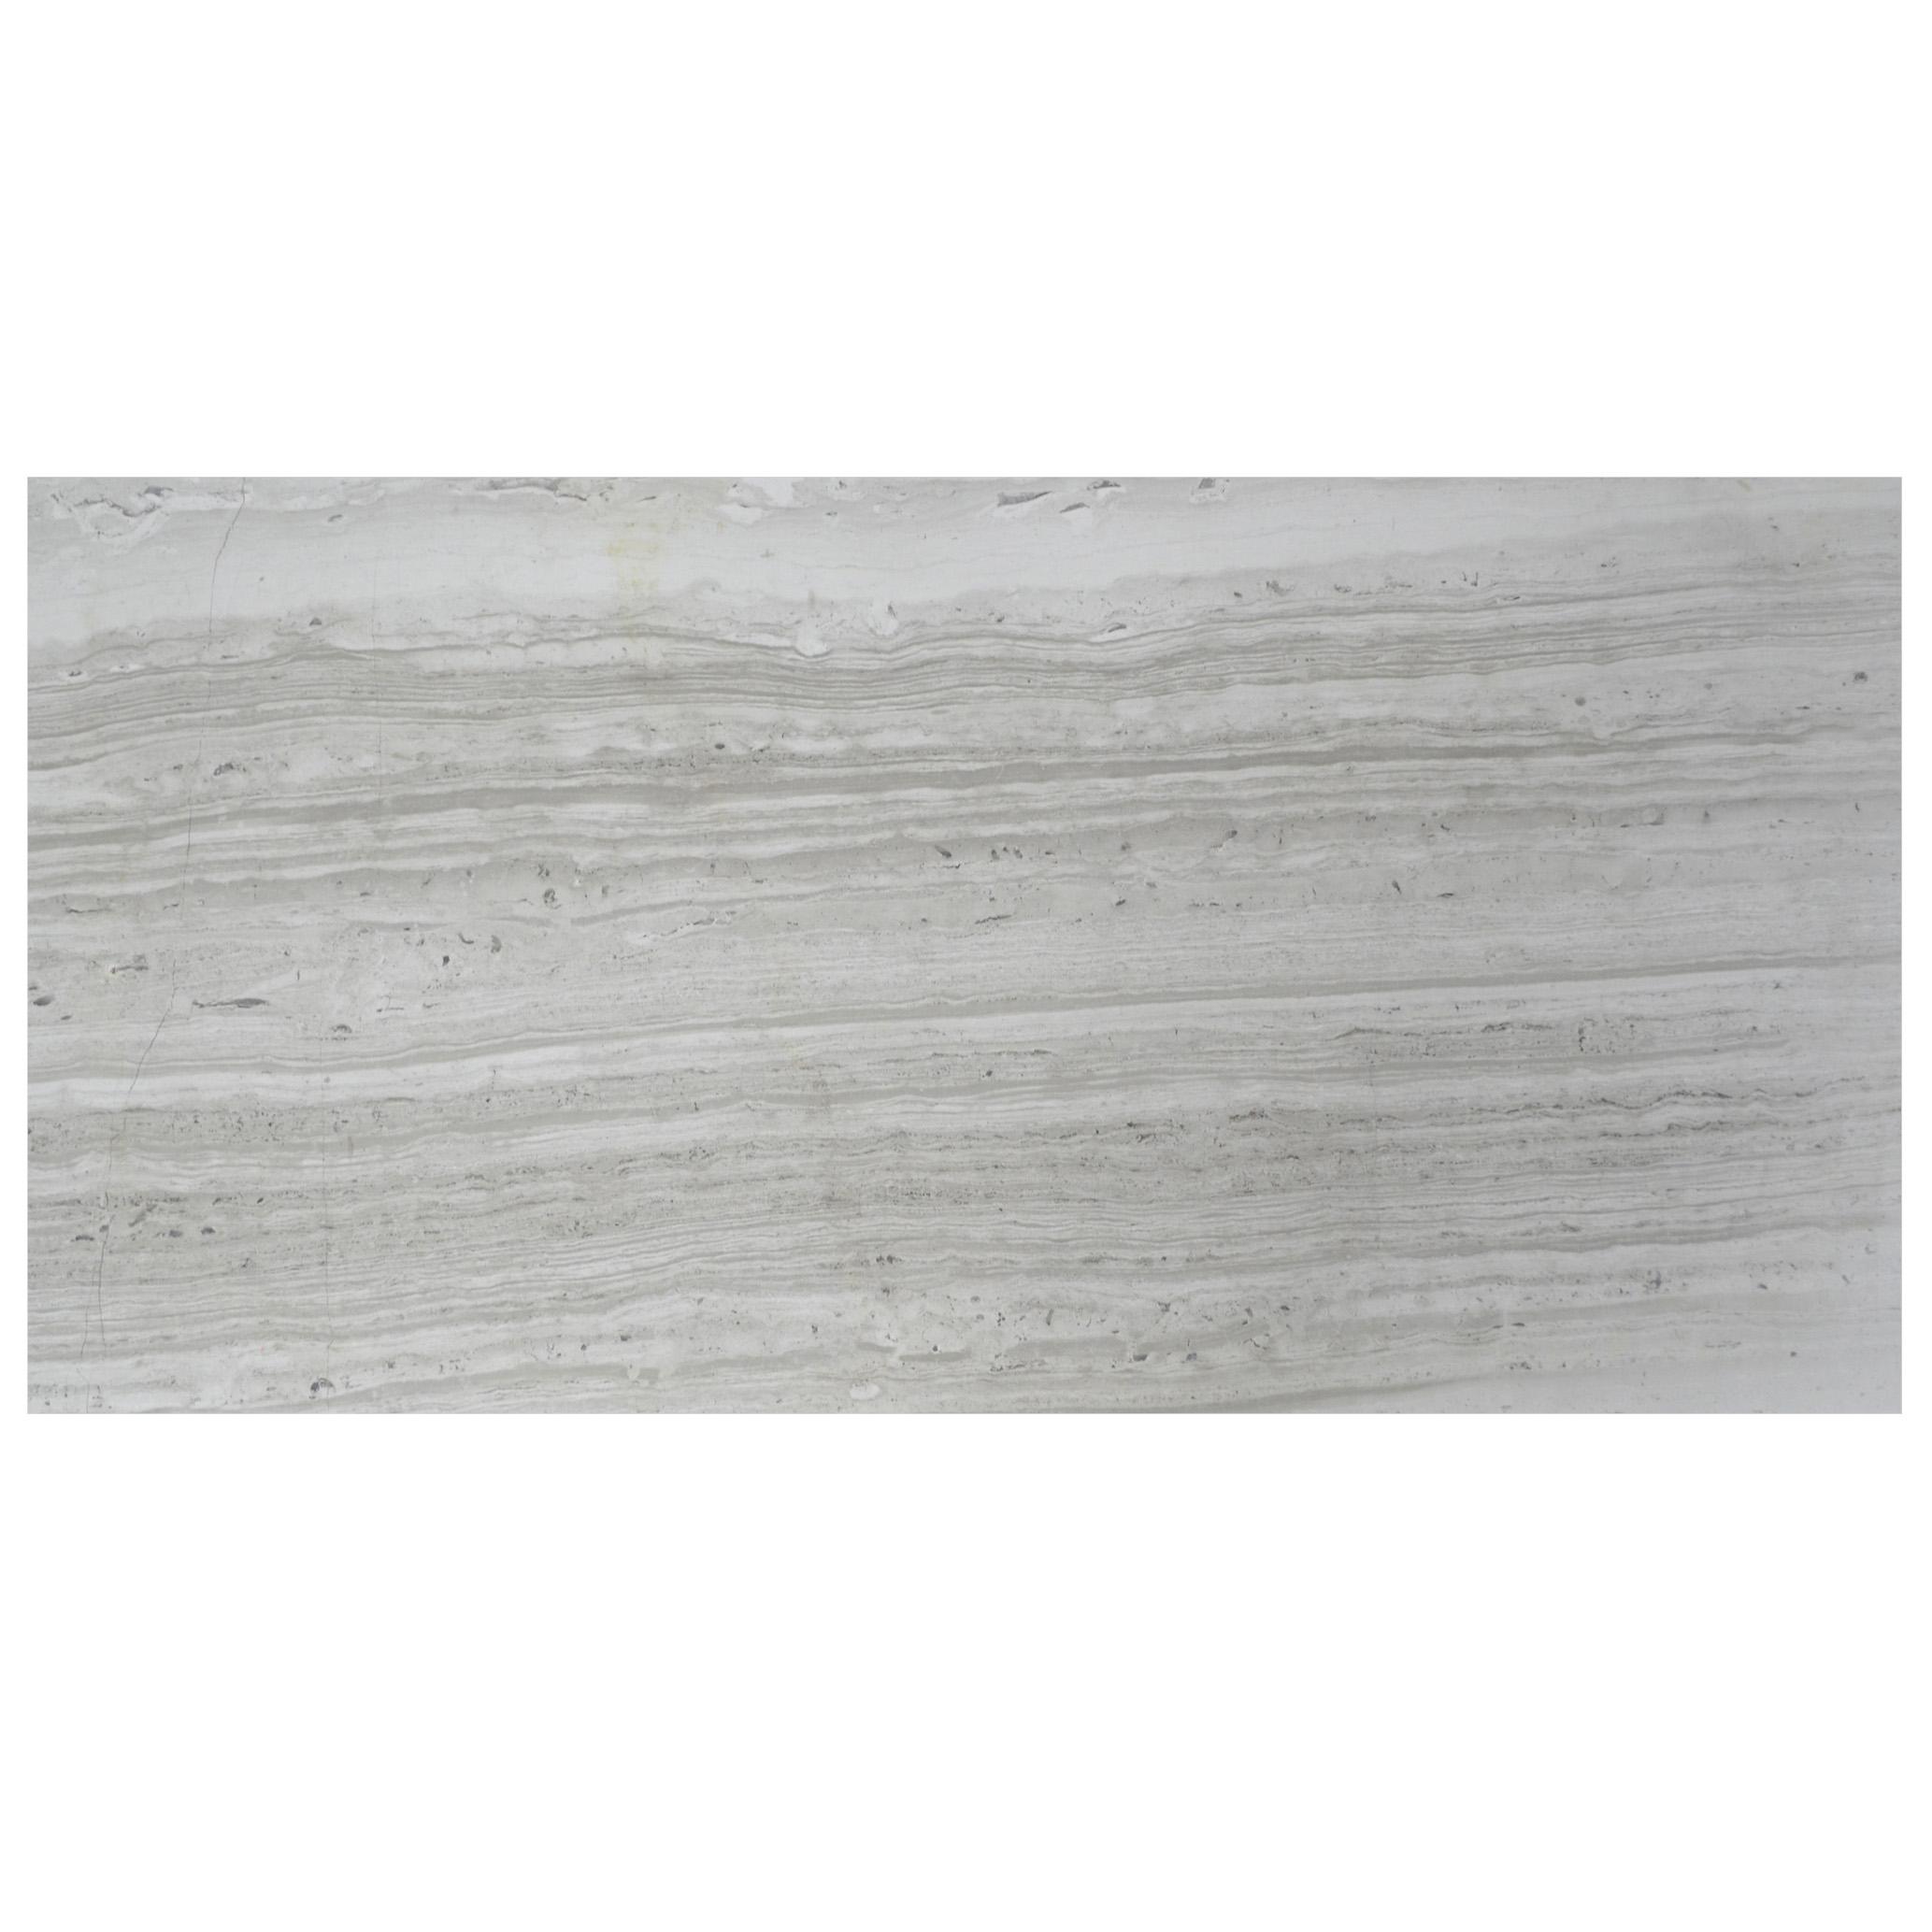 Wooden Gray Polished Limestone Tiles 18x36-marble sale-Atlantic Stone Source (2)